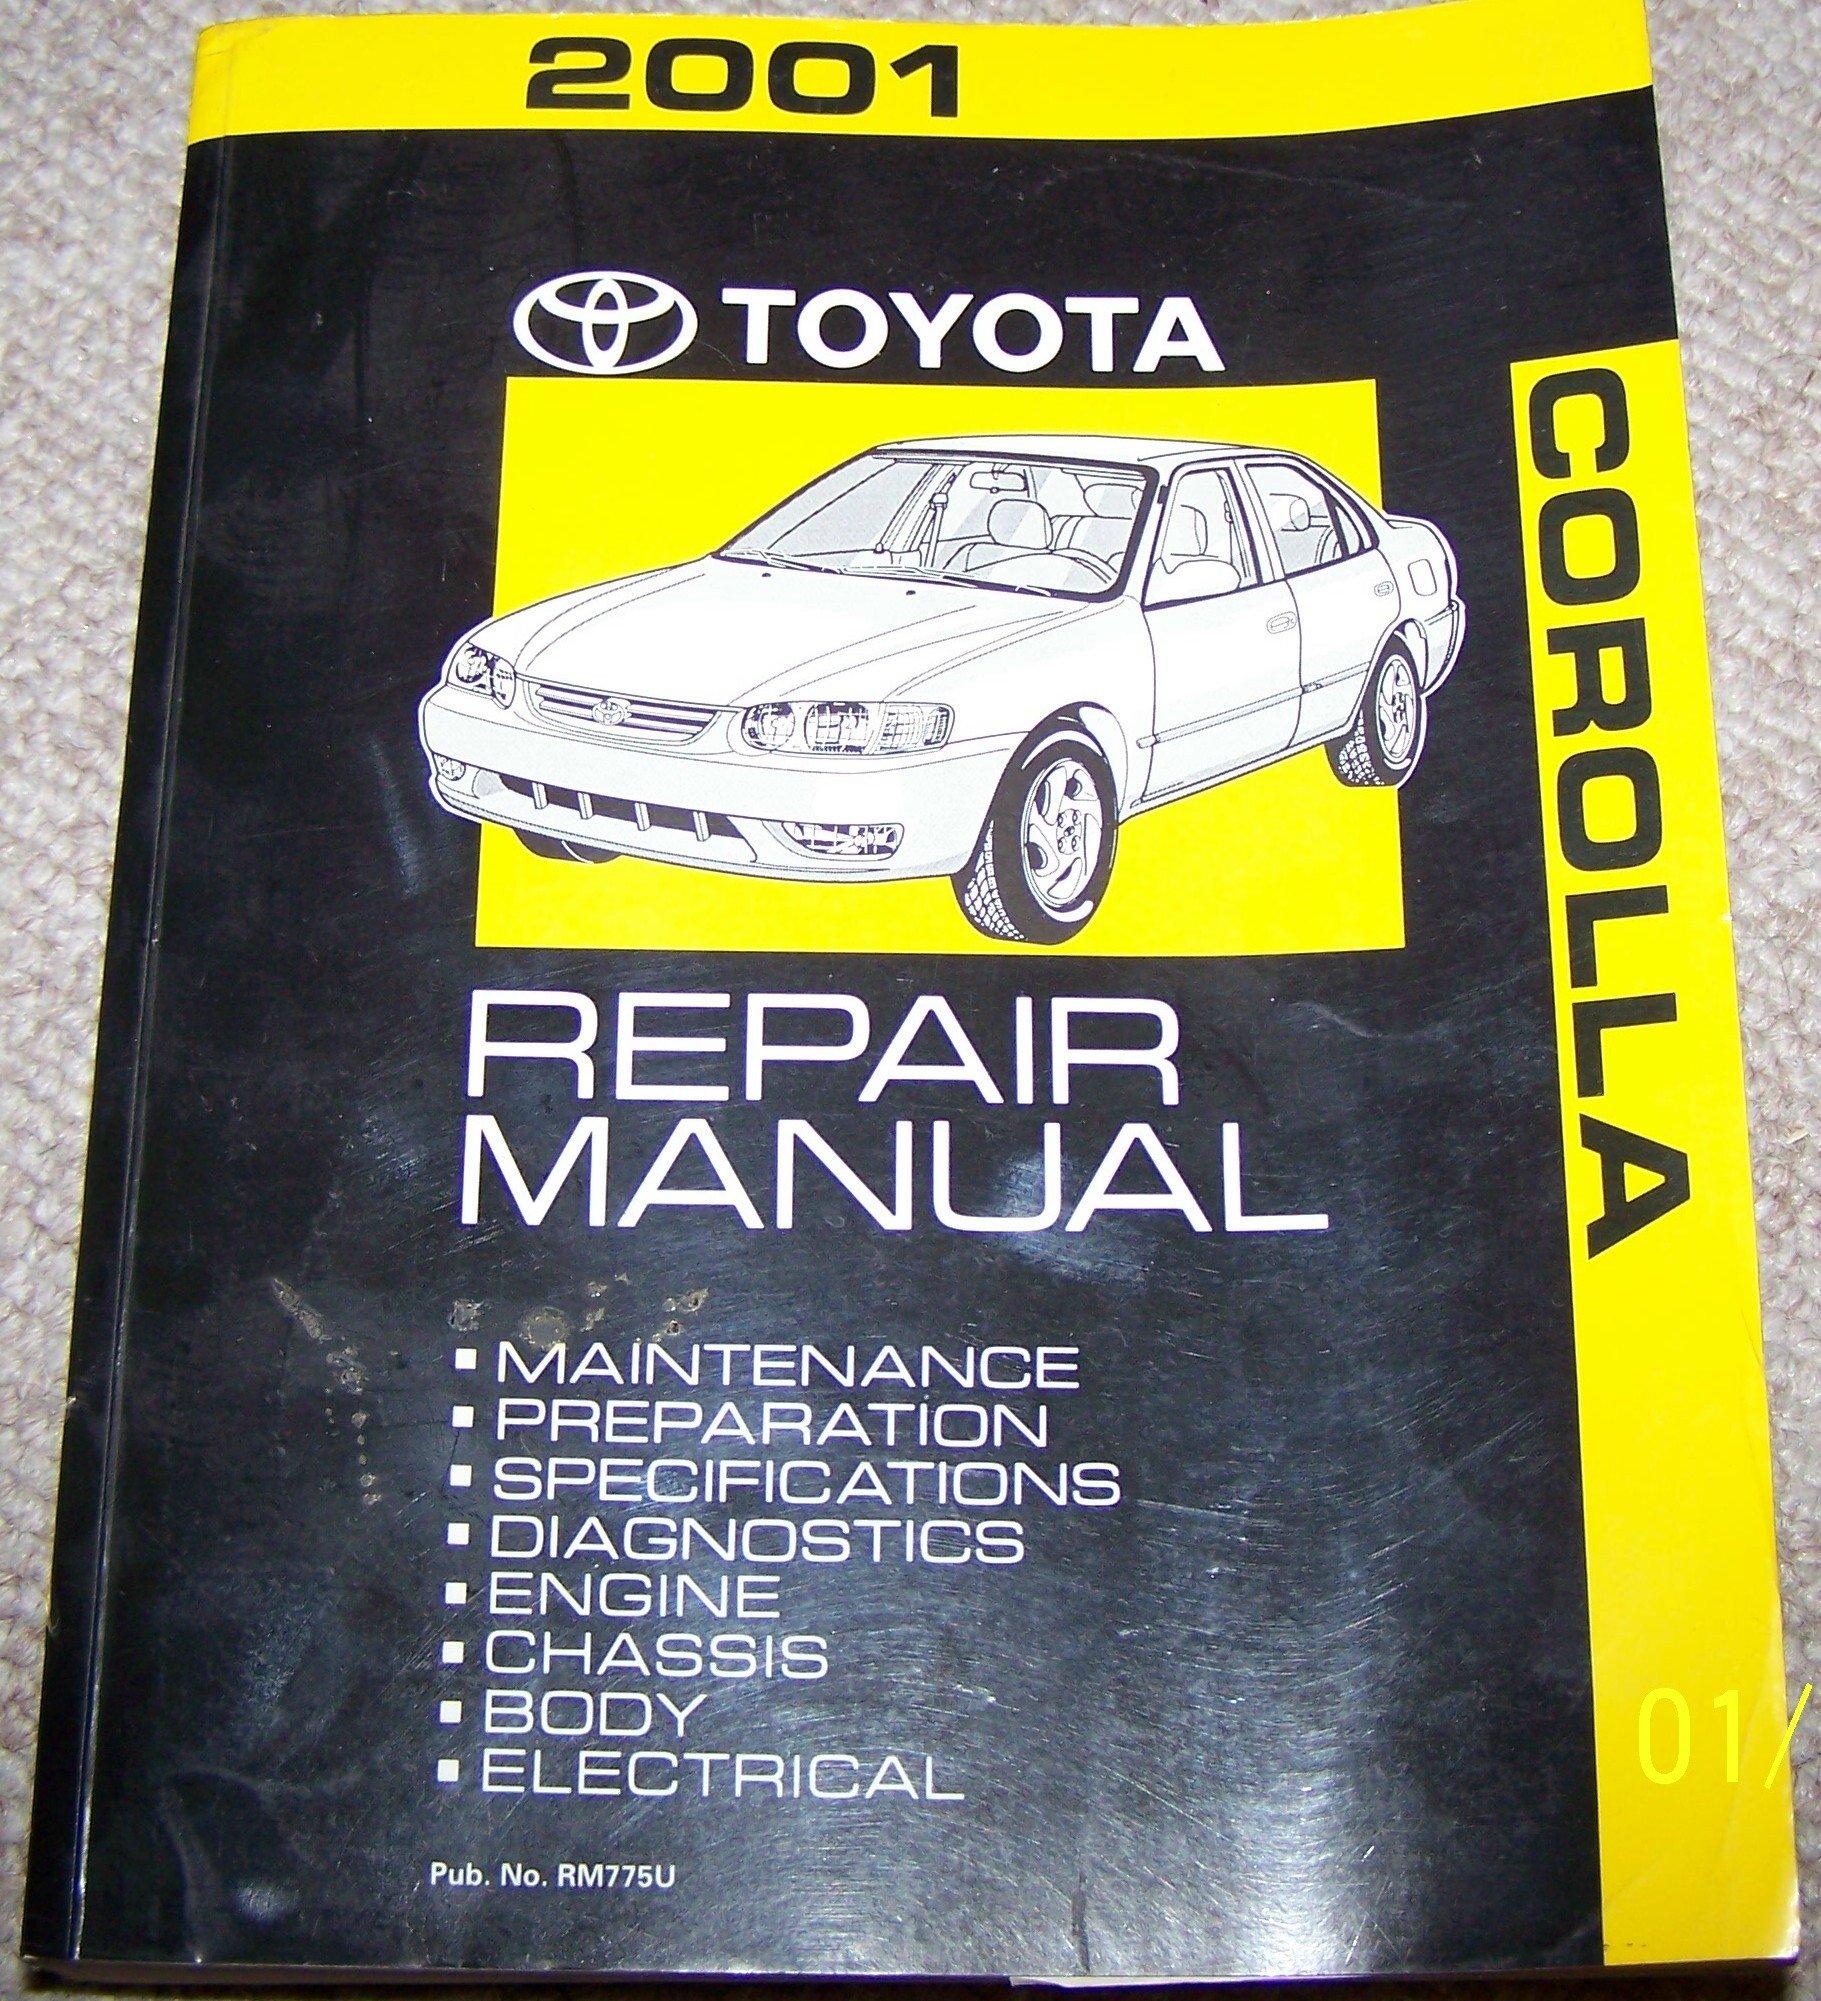 2001 Toyota Corolla Service Shop Repair Manual: Toyota Motor Corp:  Amazon.com: Books